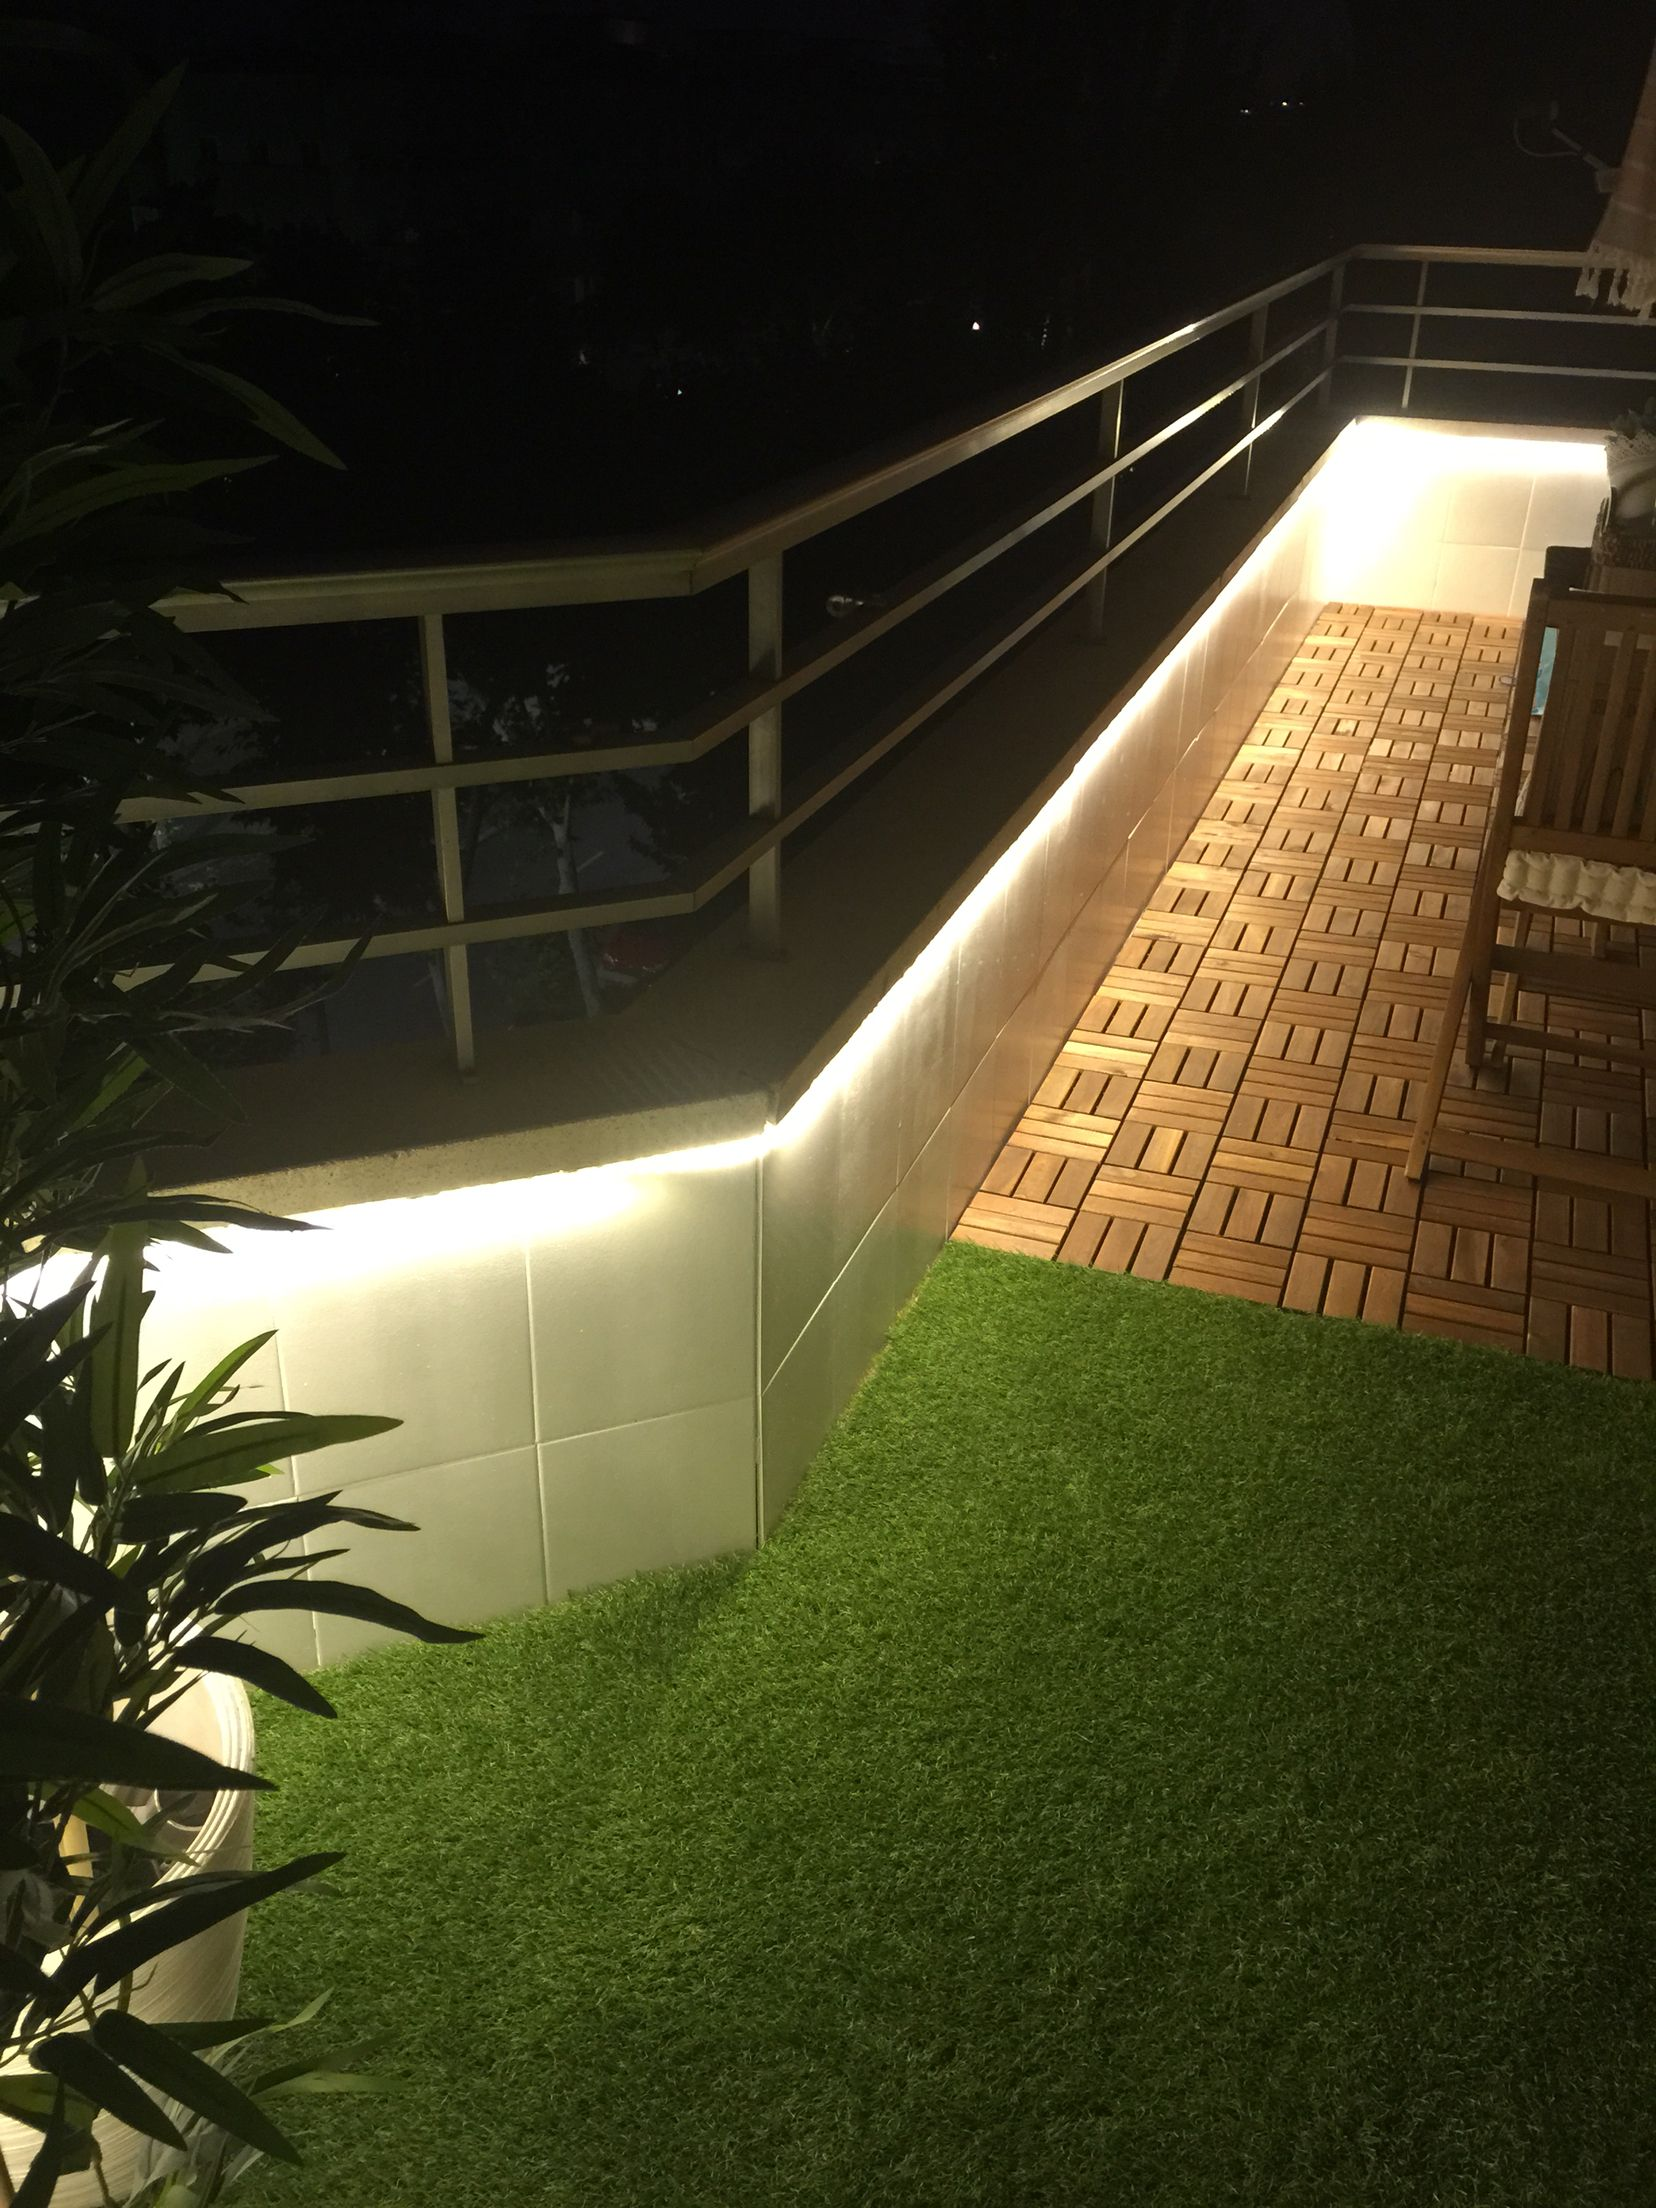 Leds Terrace césped artificial RUNNEN Ikea | Ideas para el hogar ...